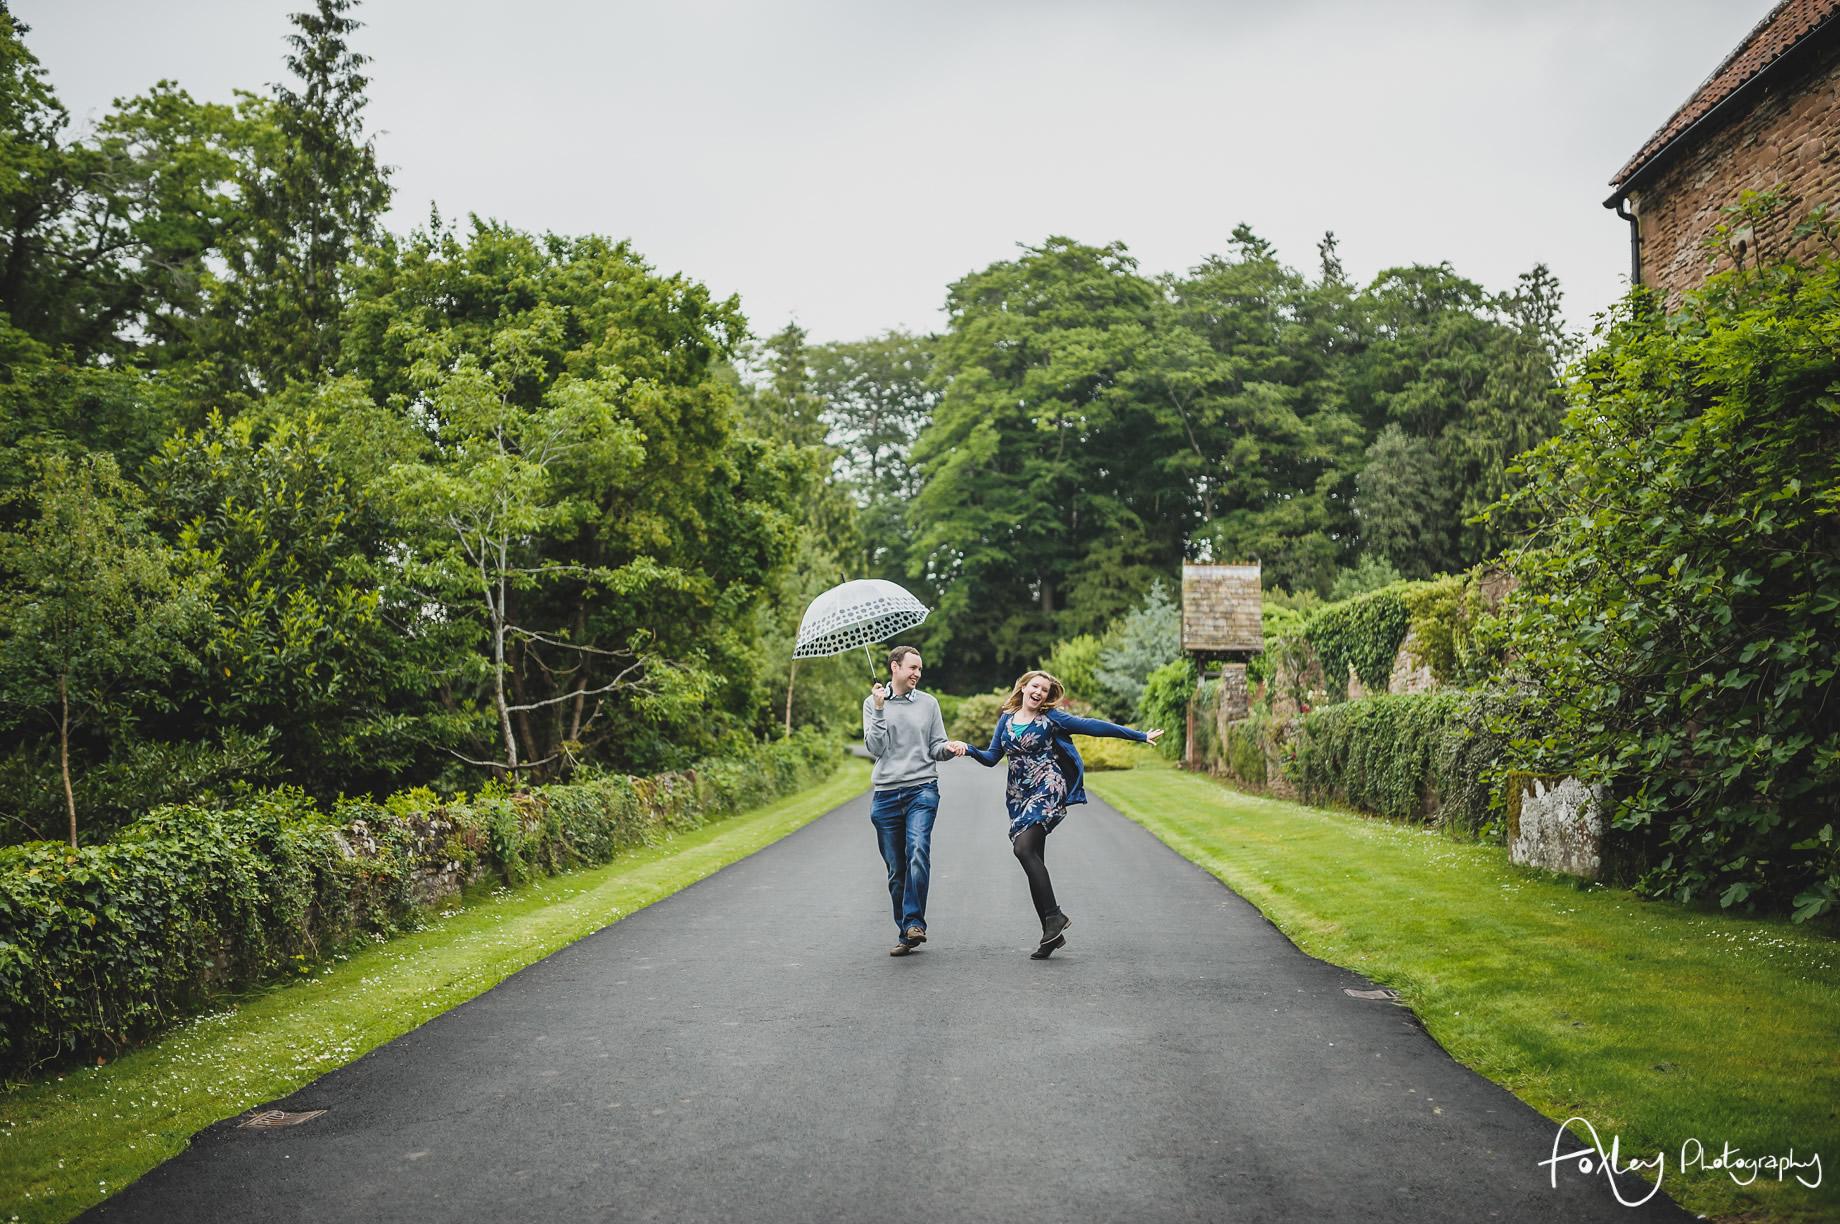 Rachel-and-Steve-Pre-Wedding-Shoot-at-The-How-Caple-Court-025